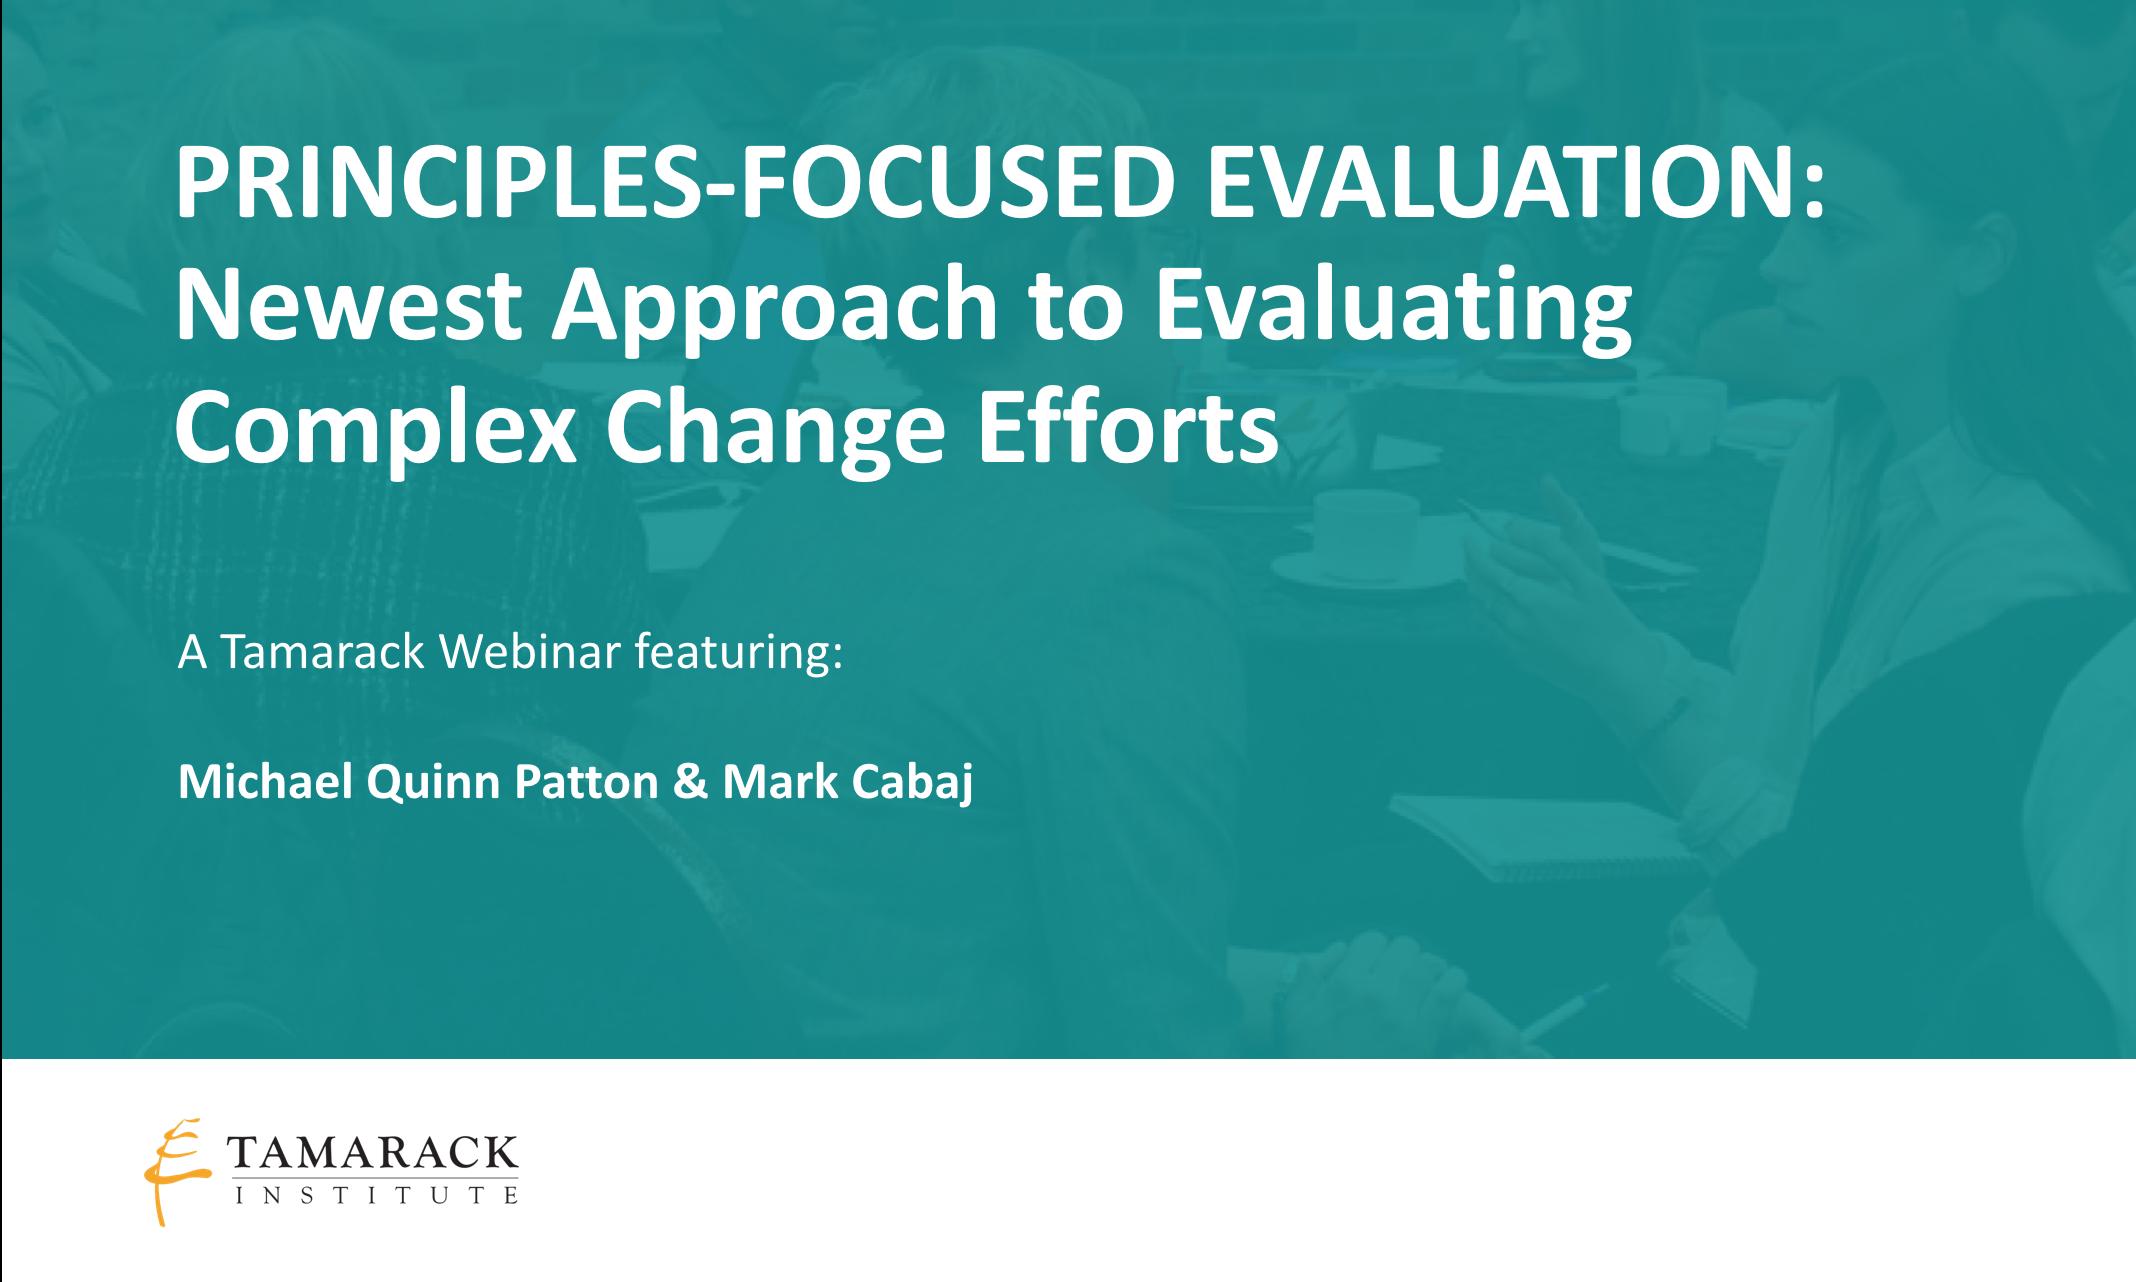 Principles-Focused Evaluation 53.png